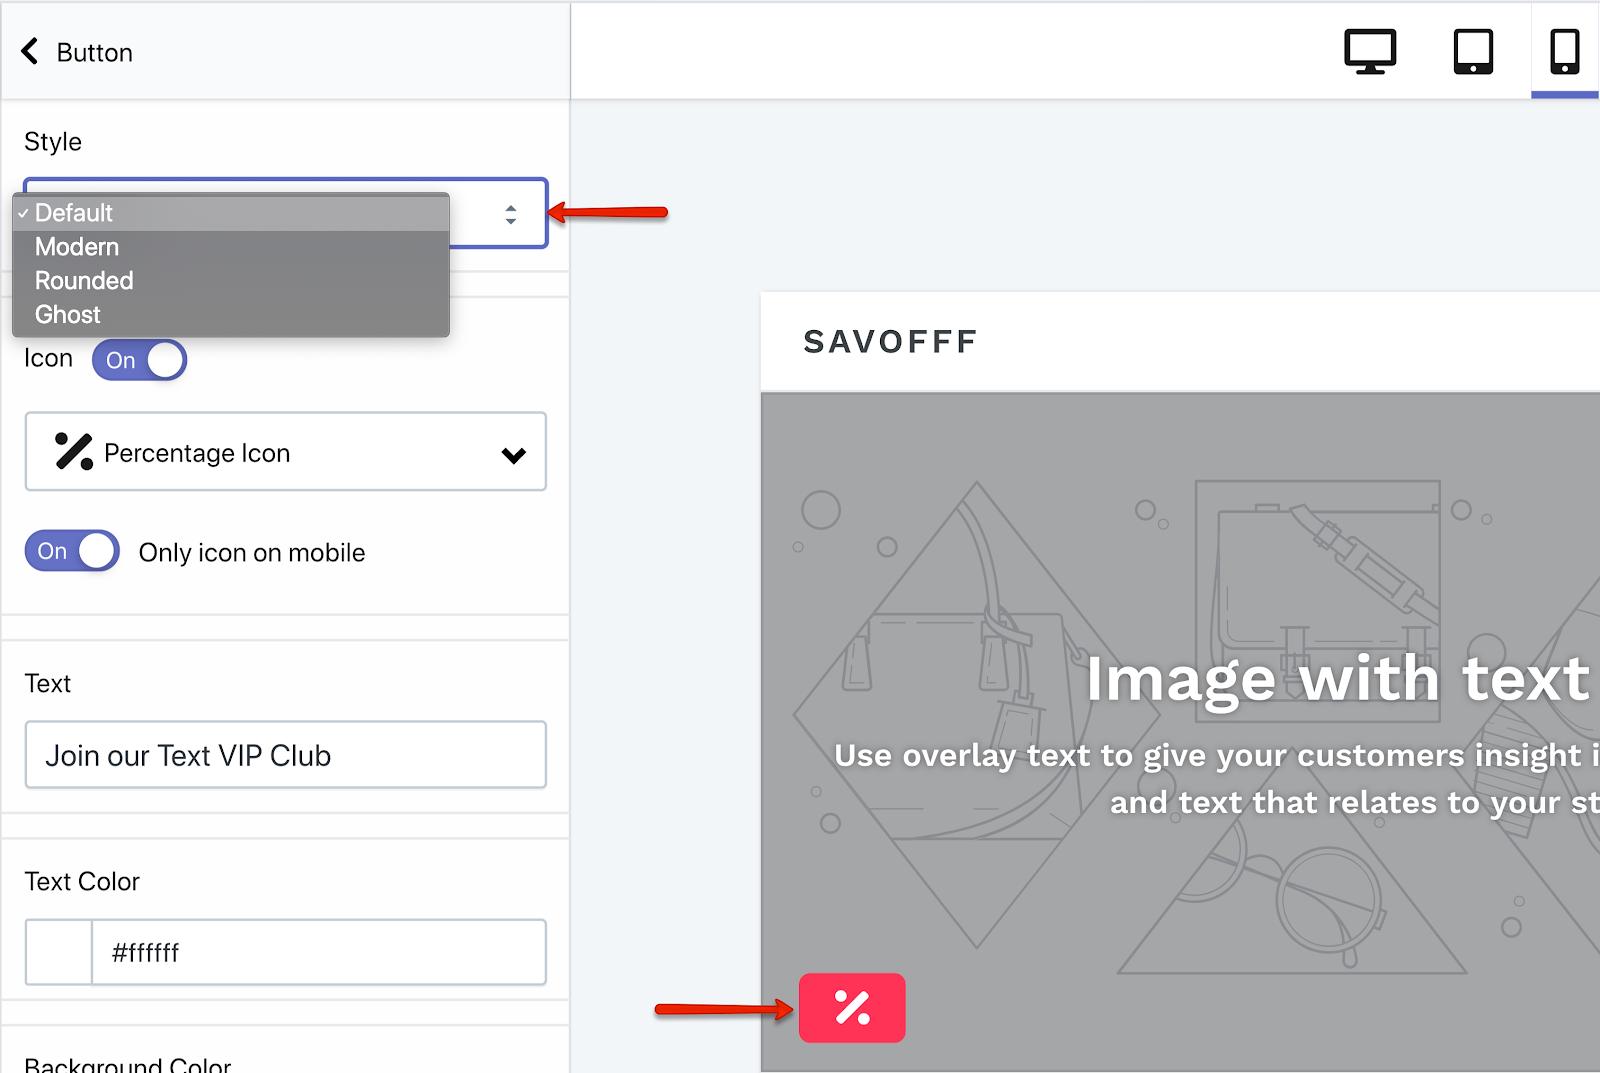 choose_button_style_SMSBump